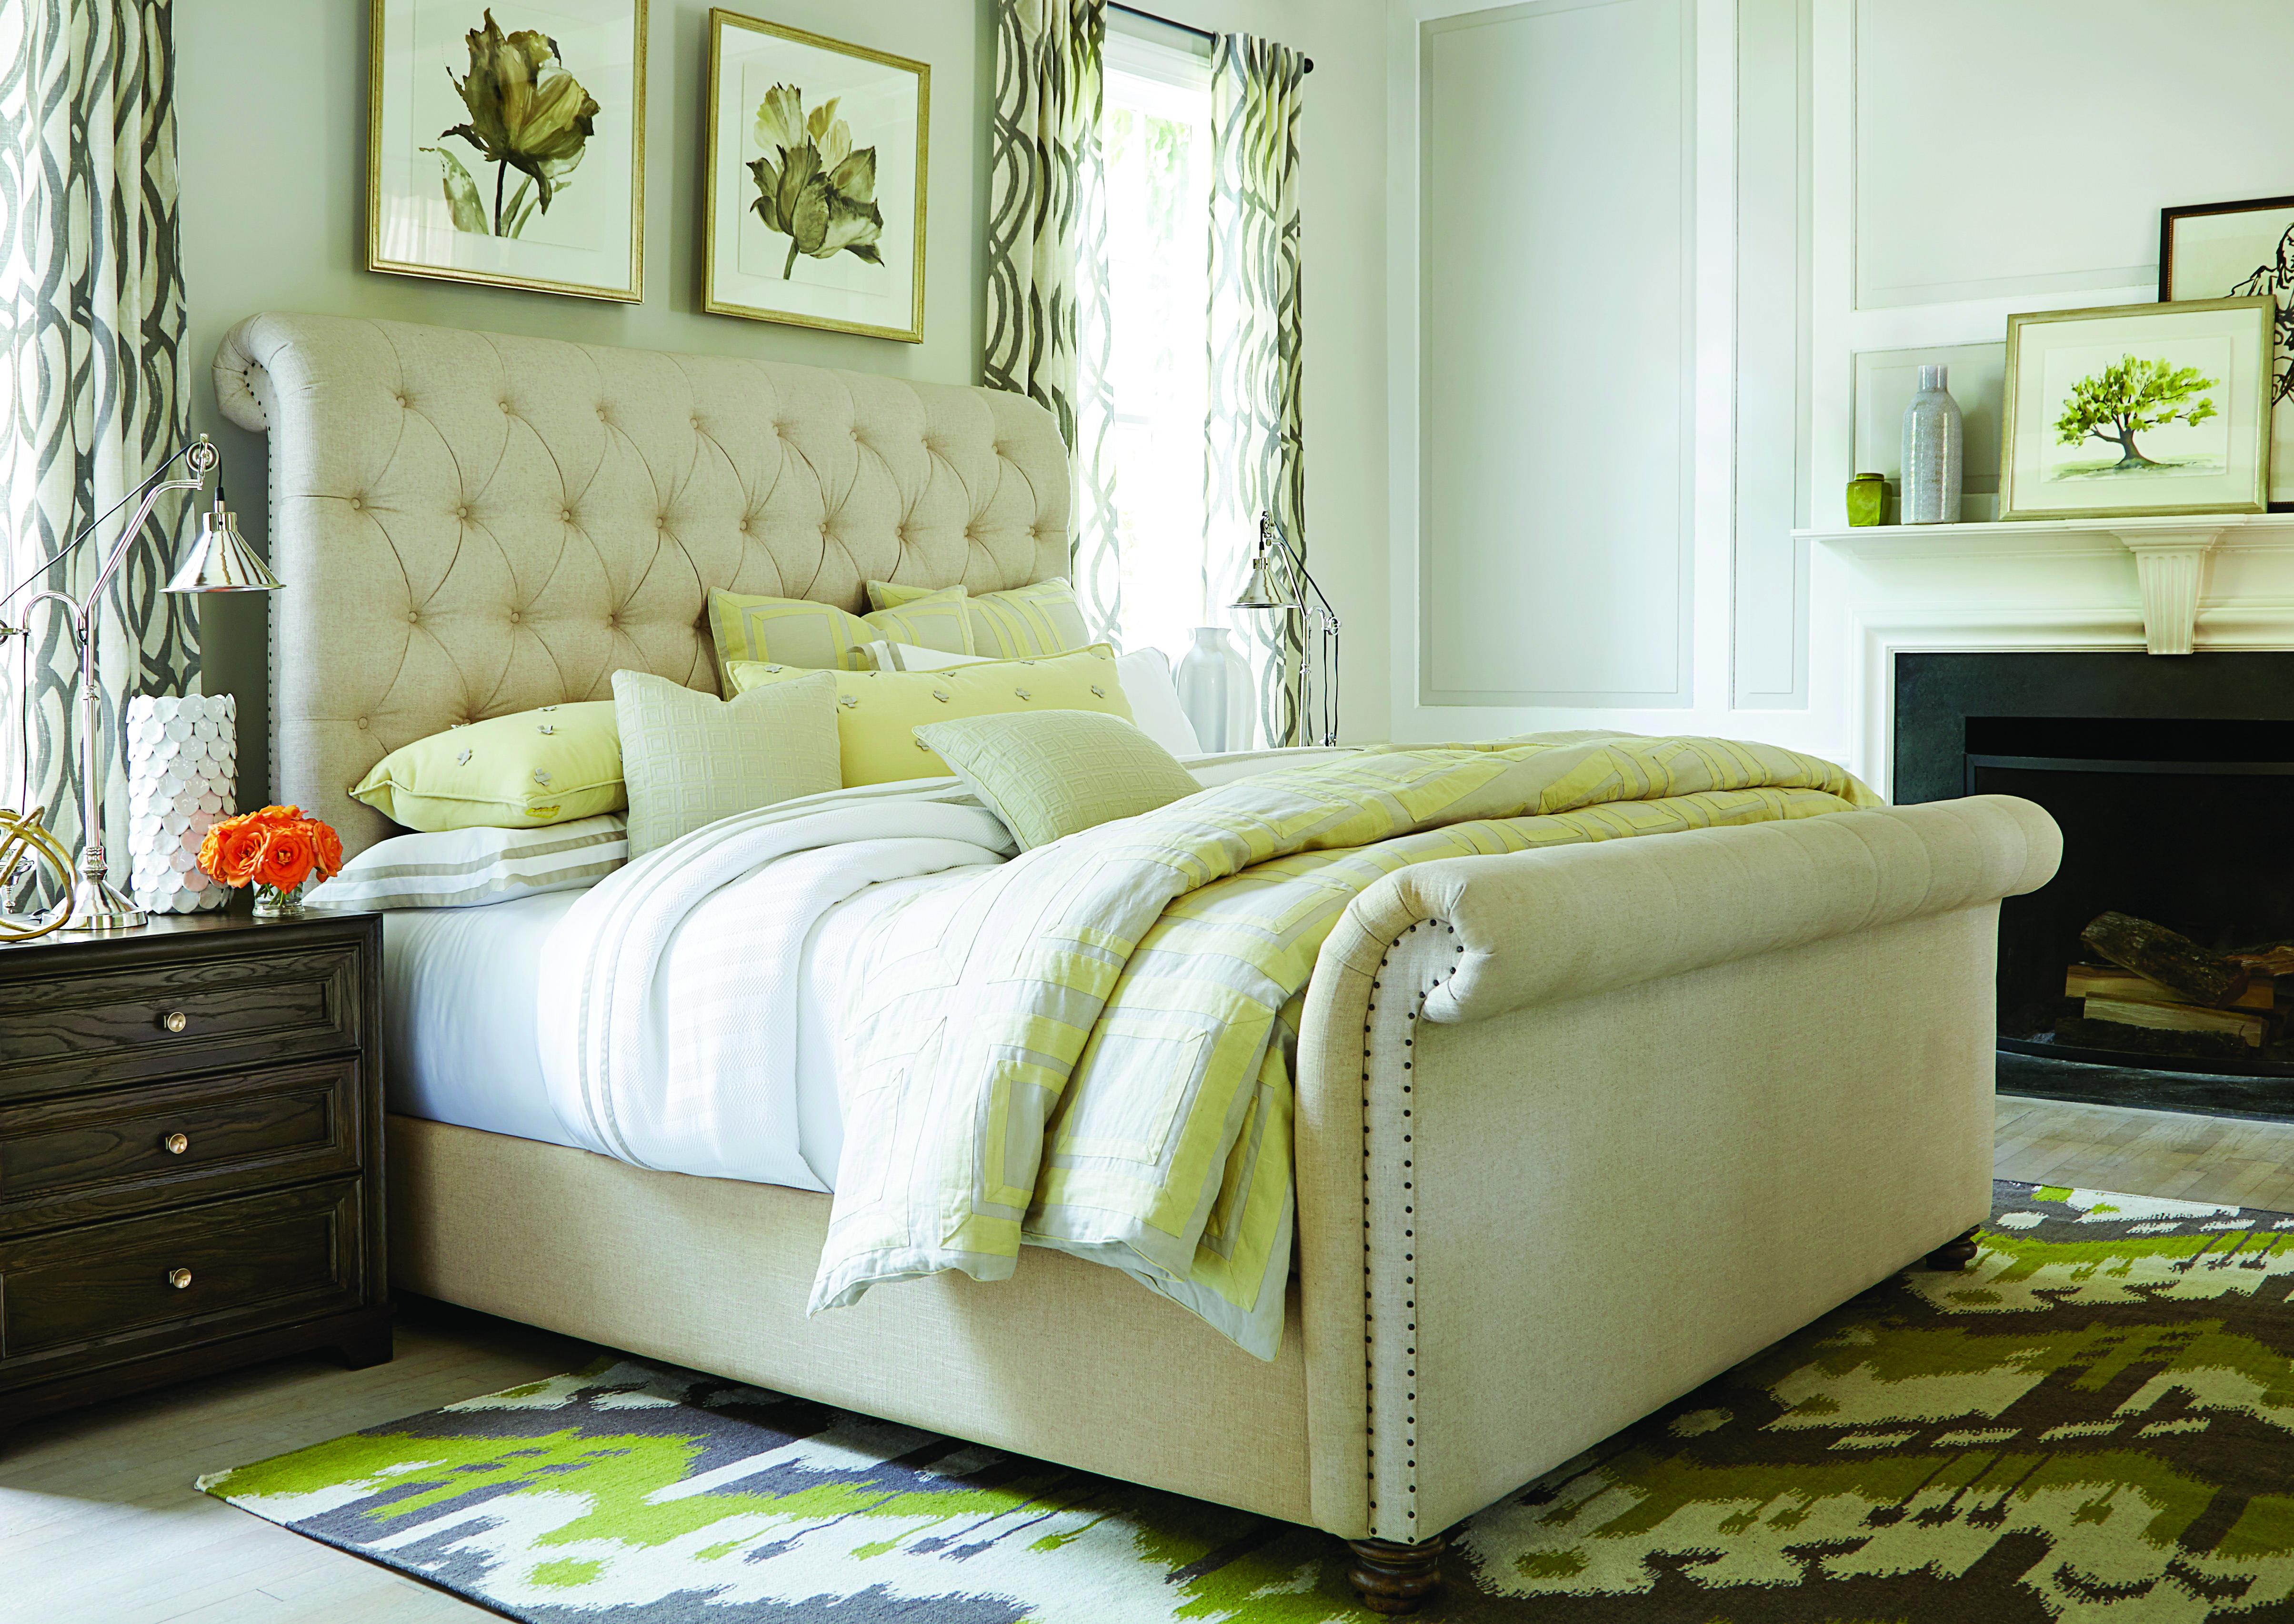 Belfort Furniture - Bed